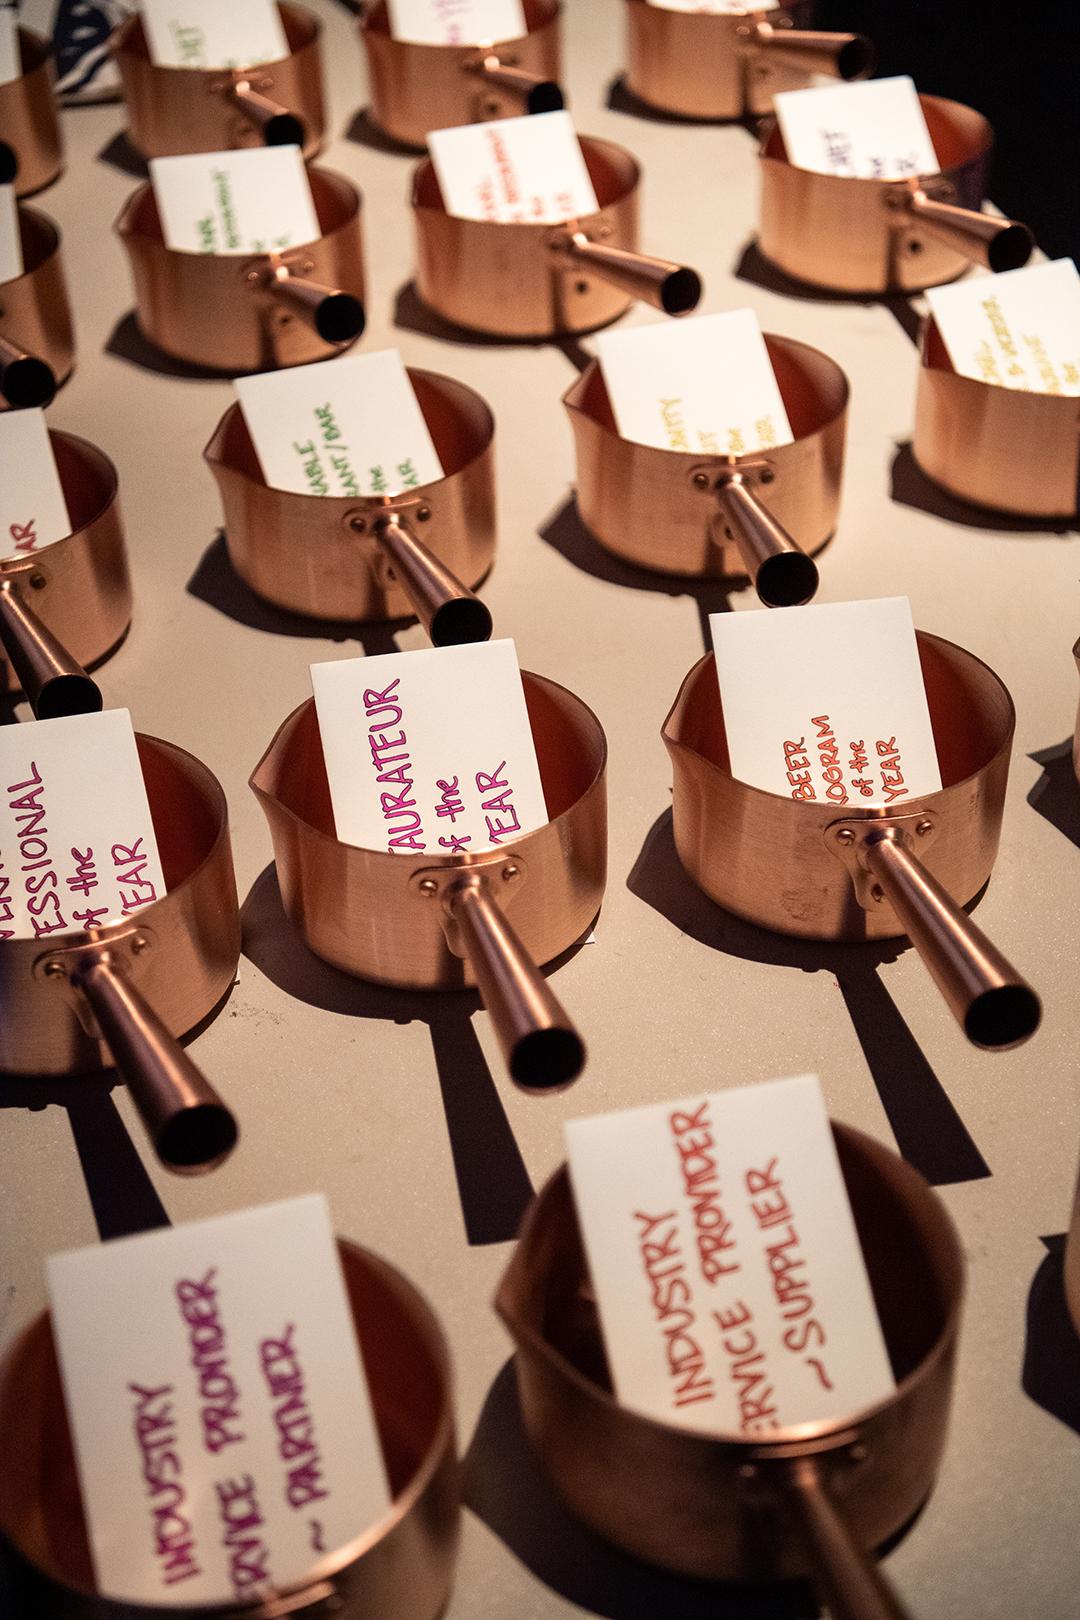 Saucy Awards, 2018 Saucy Awards, GGRA Saucy Awards, Golden Gate Restaurant Association, San Francisco Culinary Events, San Francisco Events, Emily Martin Events, Emily Martin, Event Planner, Emily Martin, The JetSetting Fashionista, Emily Martin Communications & Events, Event Planners, San Francisco Events, Food & Wine Events, San Francisco Event Planner, Event Planner, Experienced Event Planner, Luxury Events, G9 Event Photography